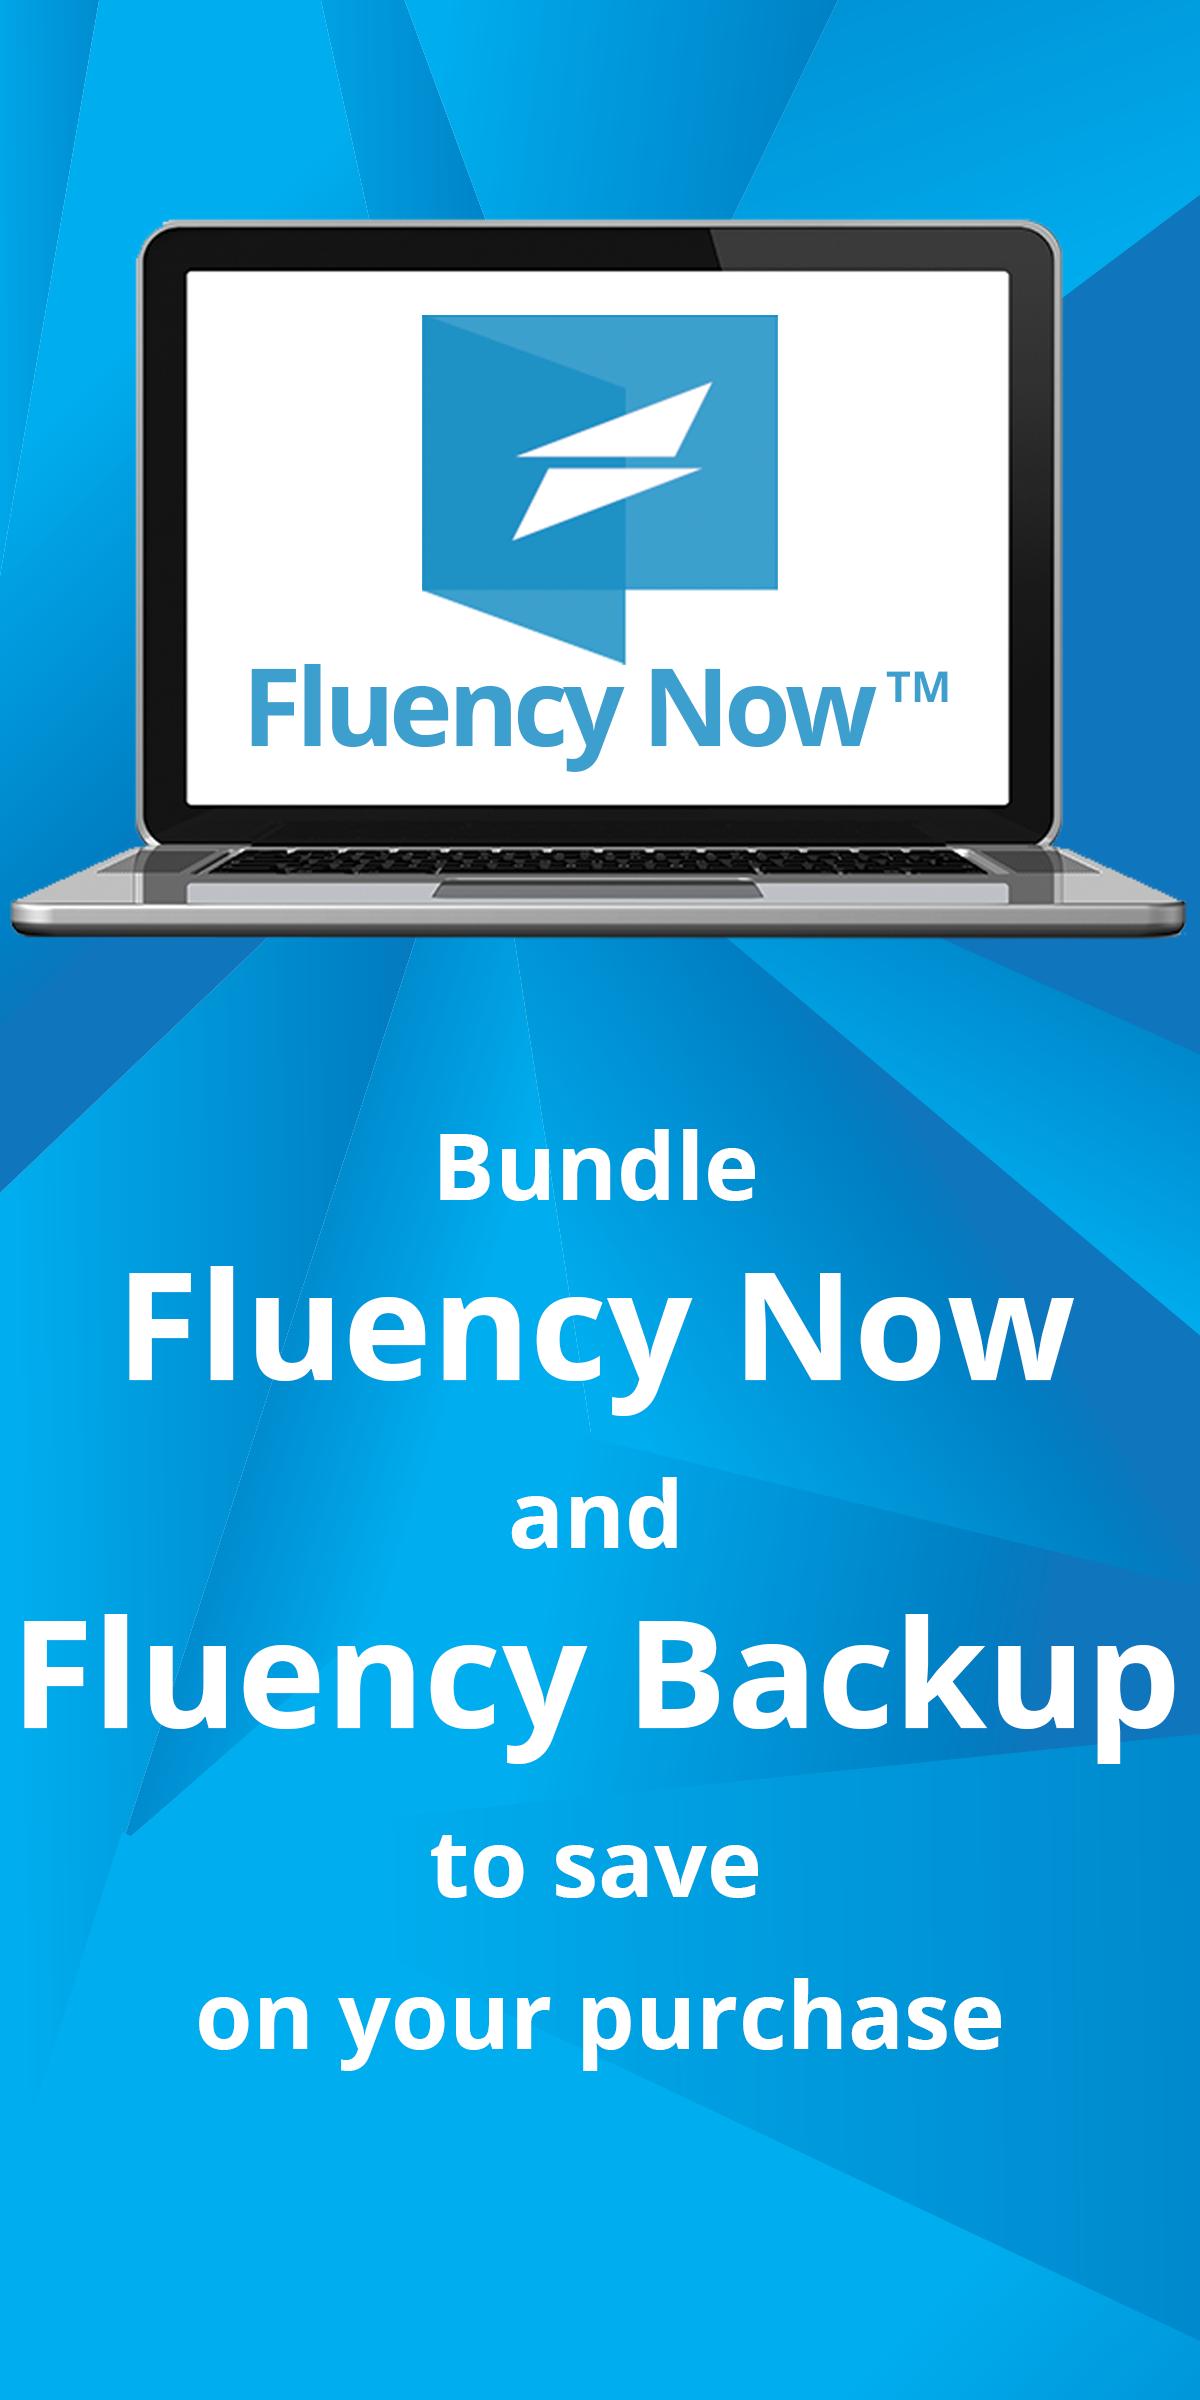 Fluency Promo